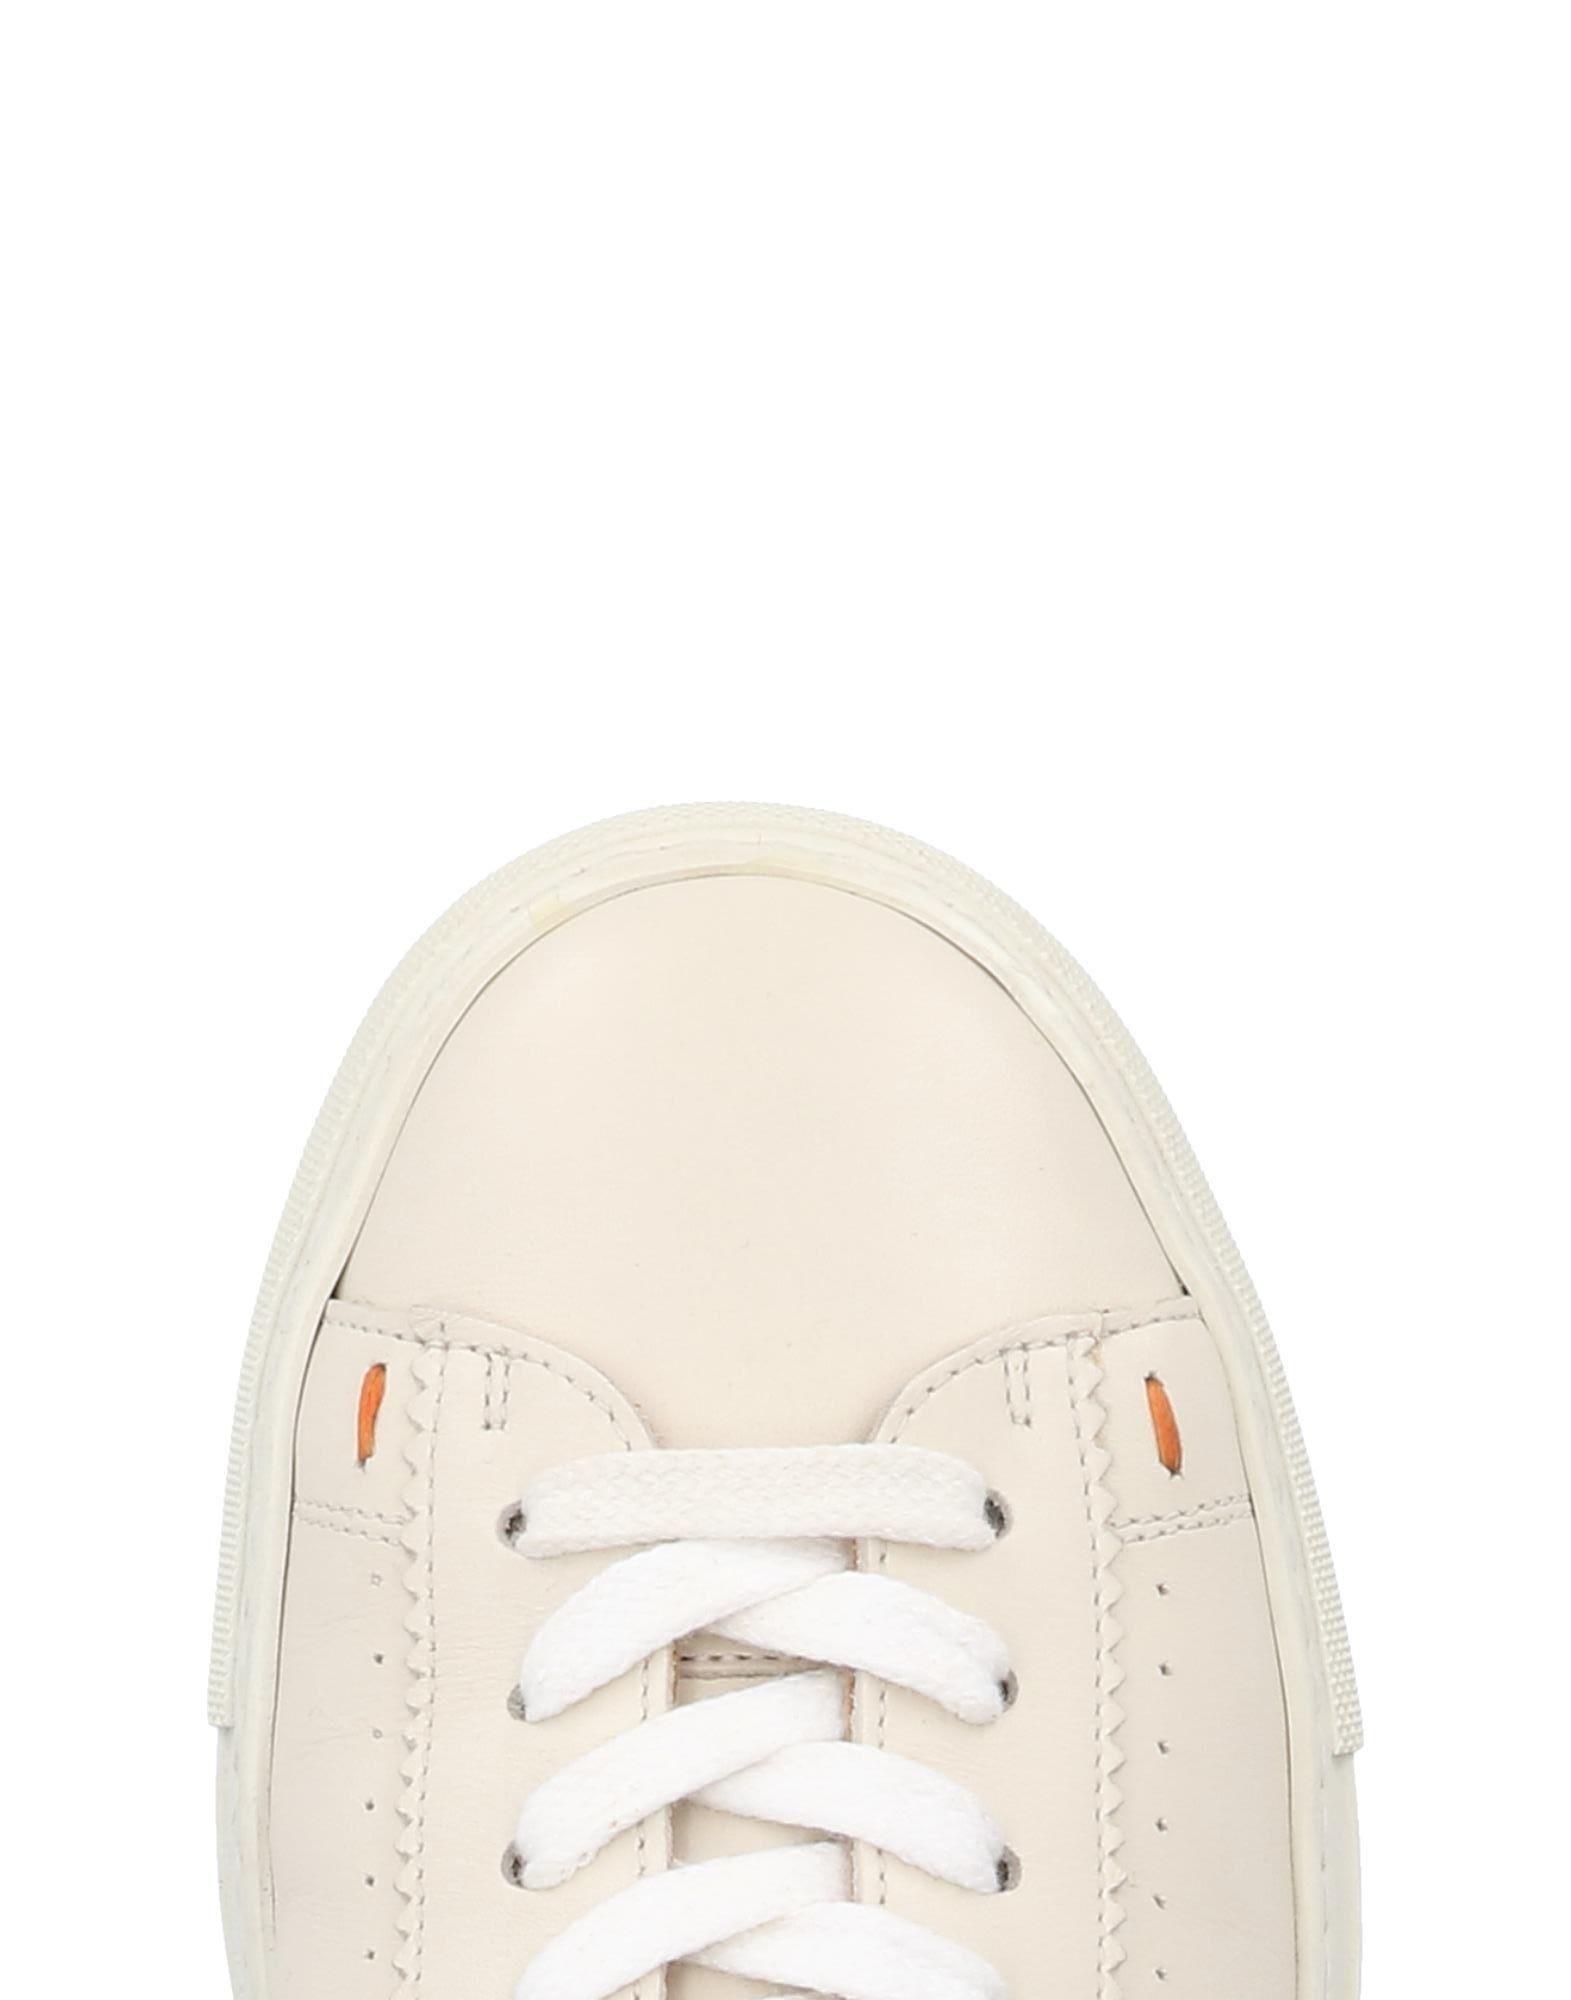 Henderson Sneakers Gute Herren  11452359MJ Gute Sneakers Qualität beliebte Schuhe 7edcb0